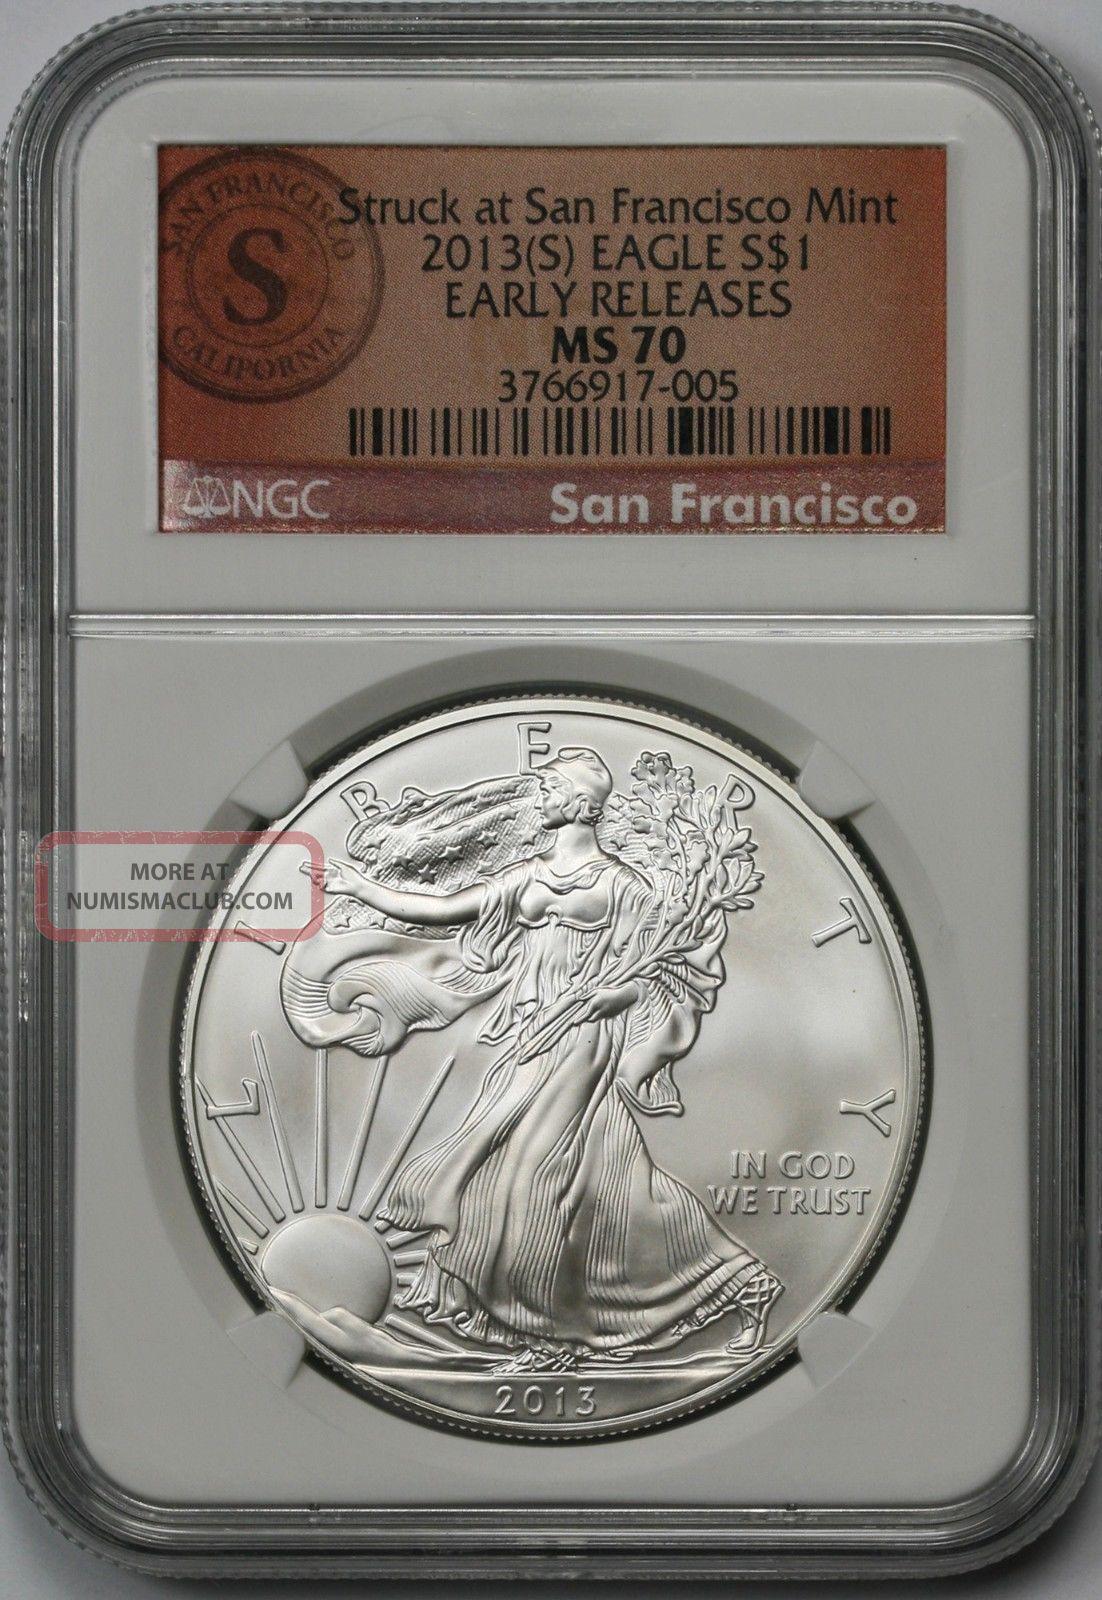 2013 S Silver Eagle 1 Ms 70 Ngc E R Struck At San